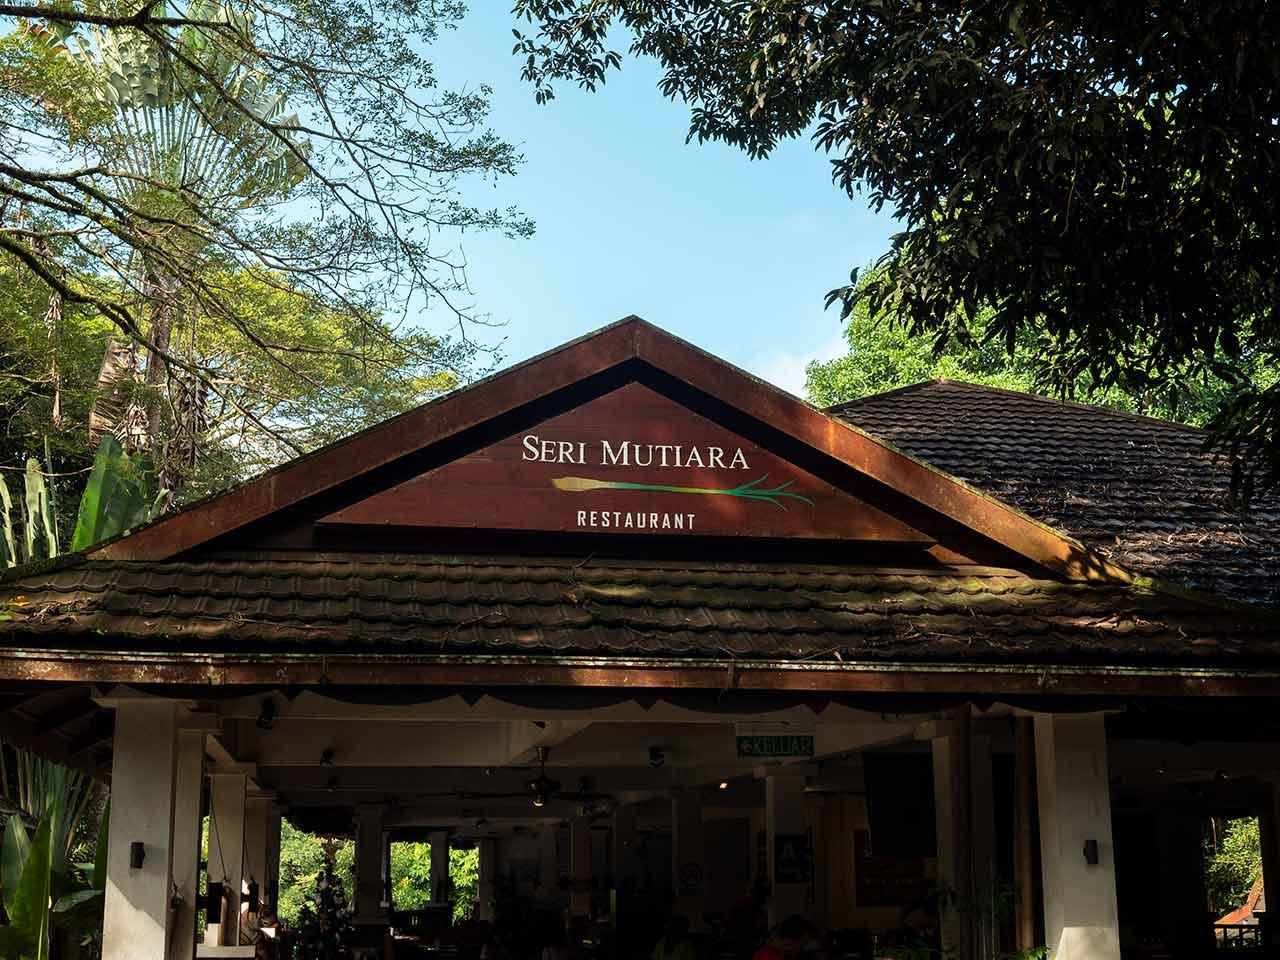 Das Seri Mutiara Restaurant im Taman Negara Nationalpark